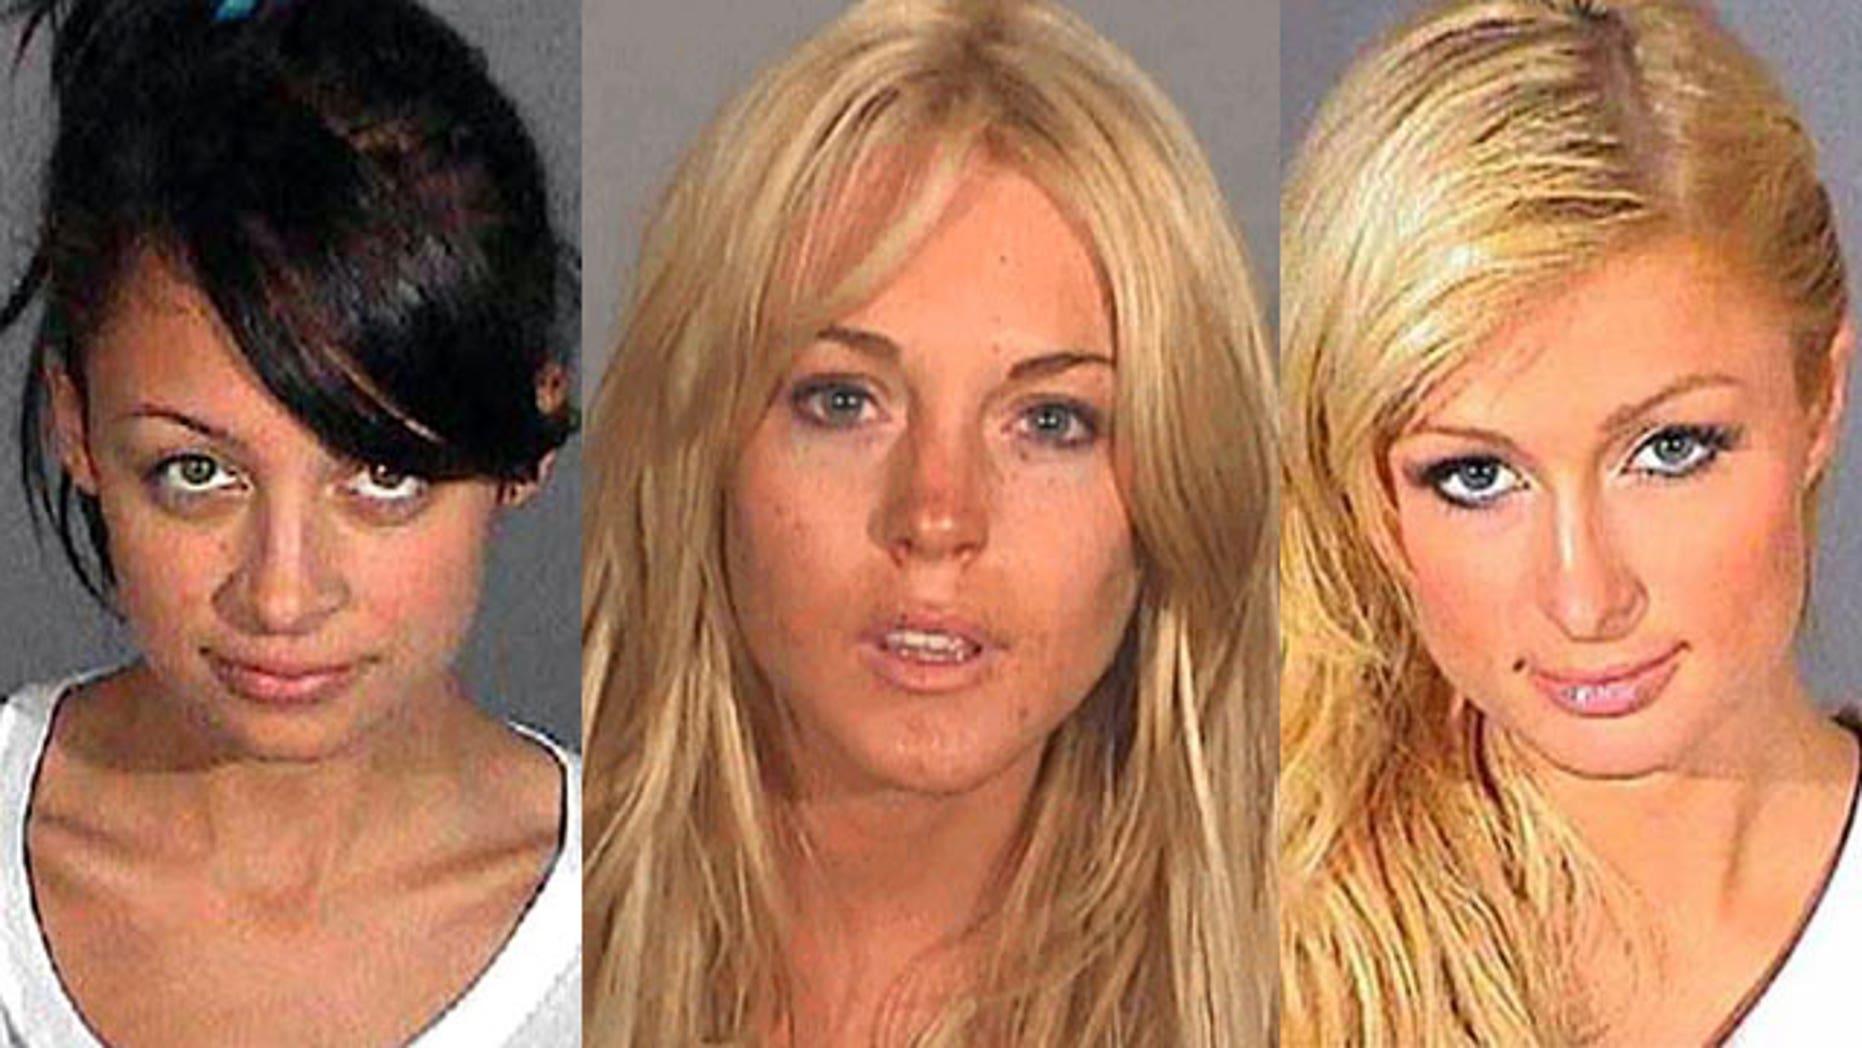 The mug shots of Nicole Richie, Lindsay Lohan, and Paris Hilton.